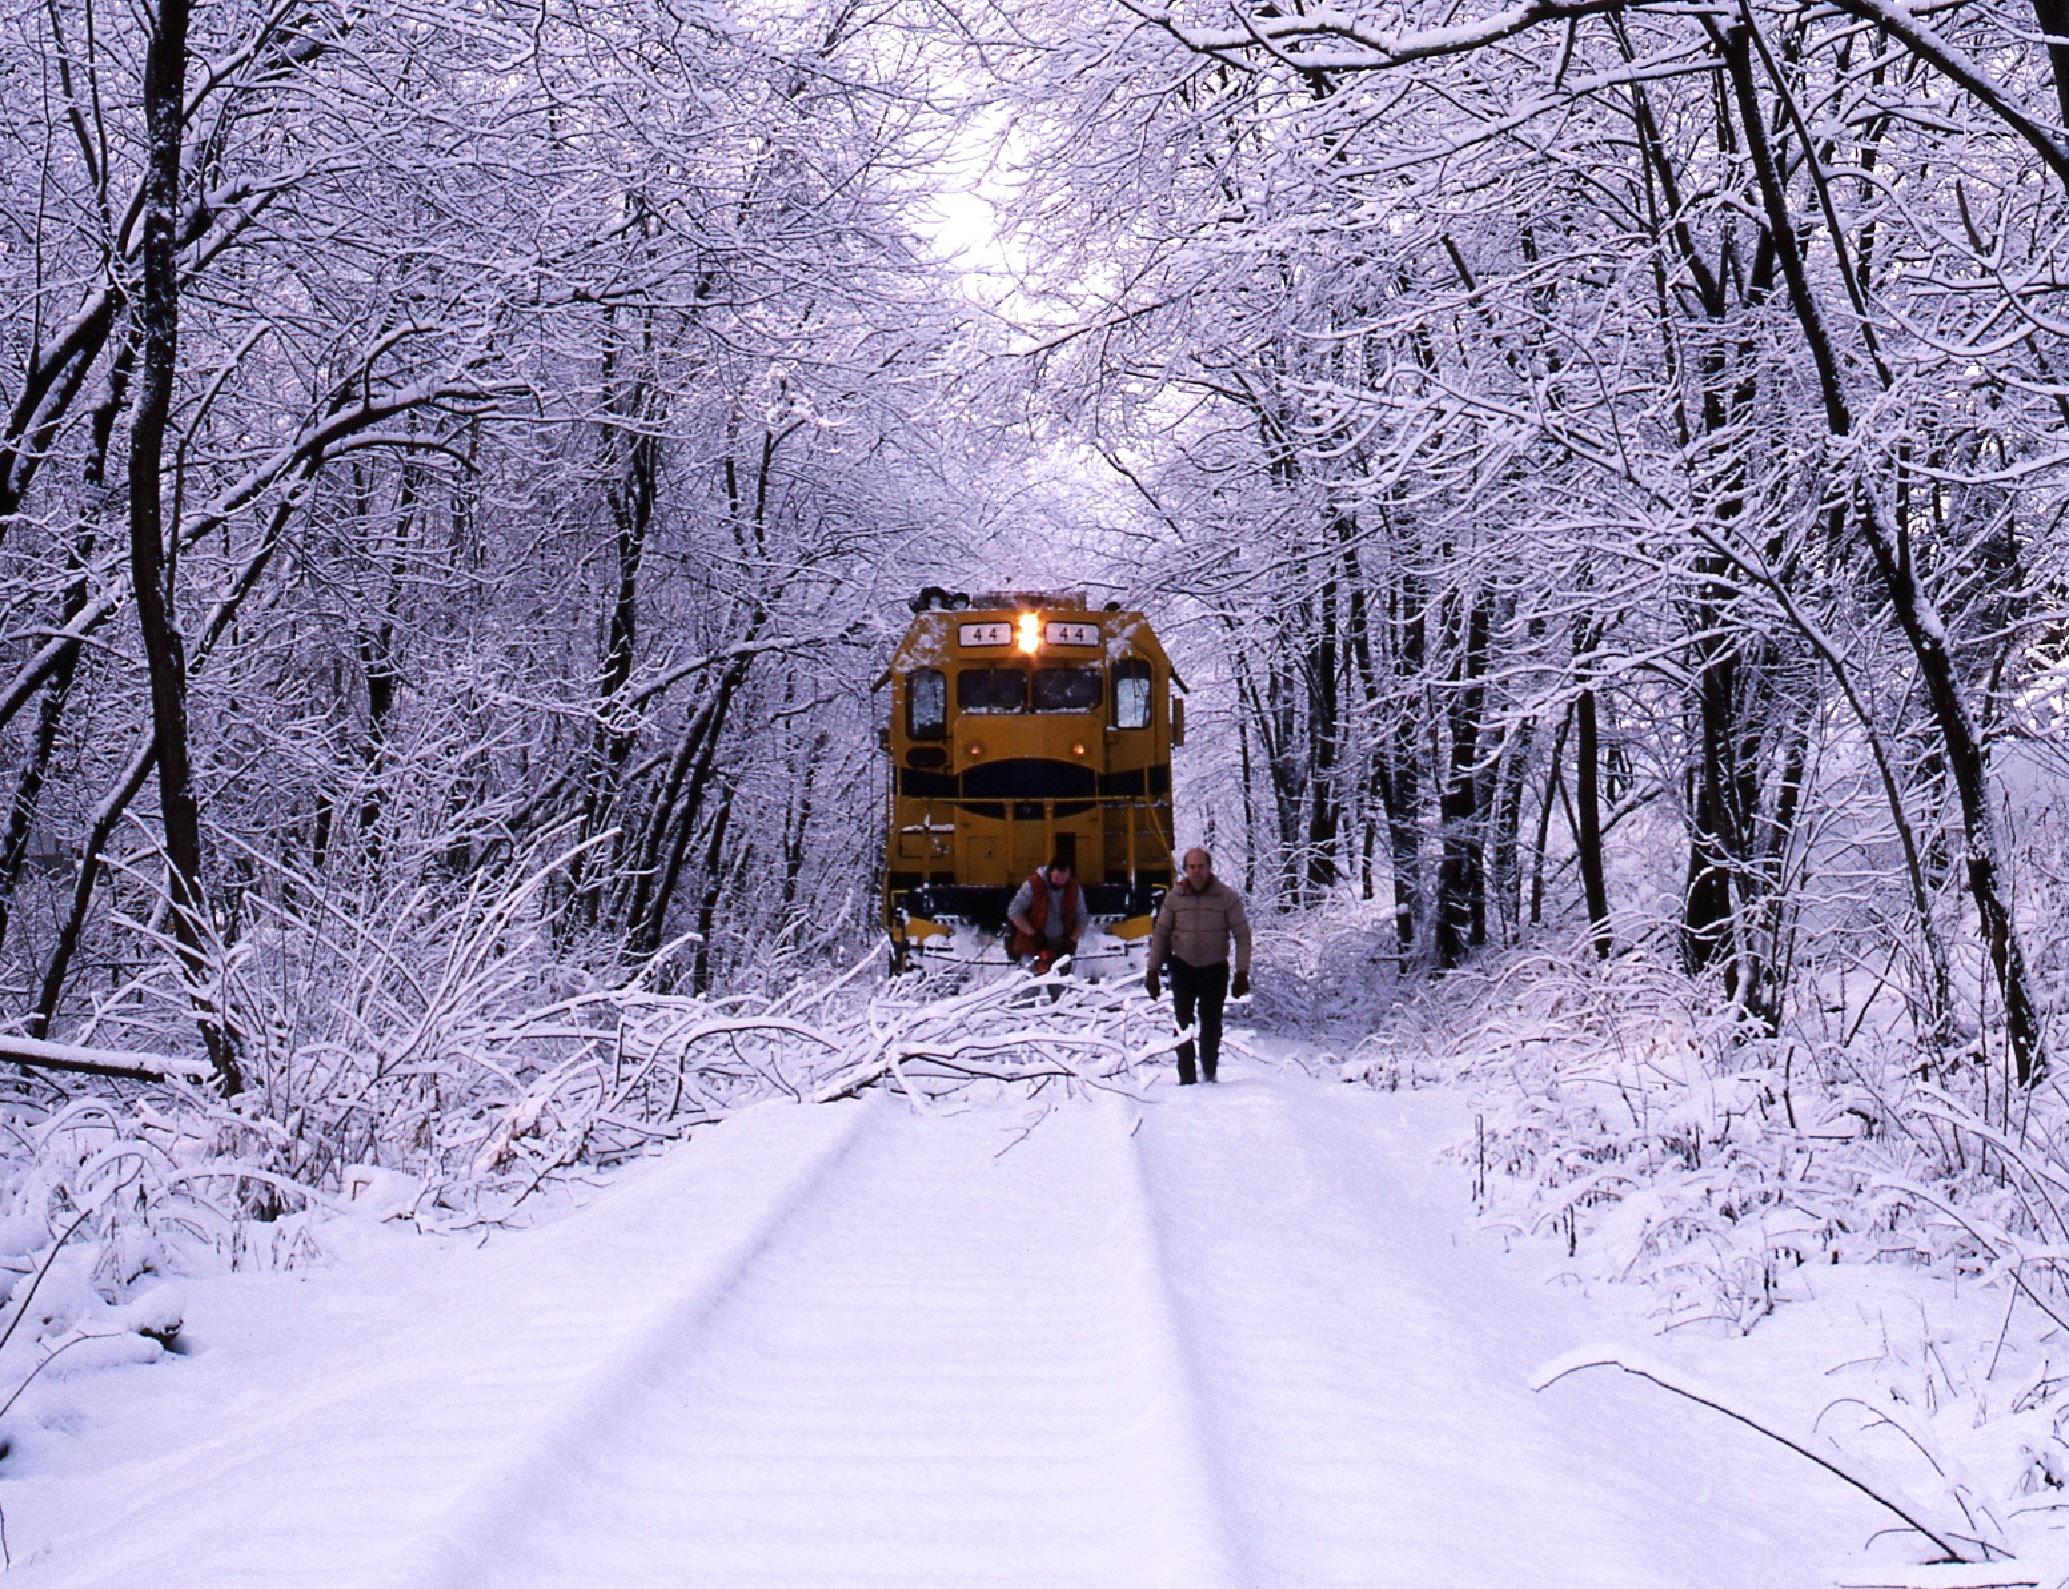 Dick_snow.jpg